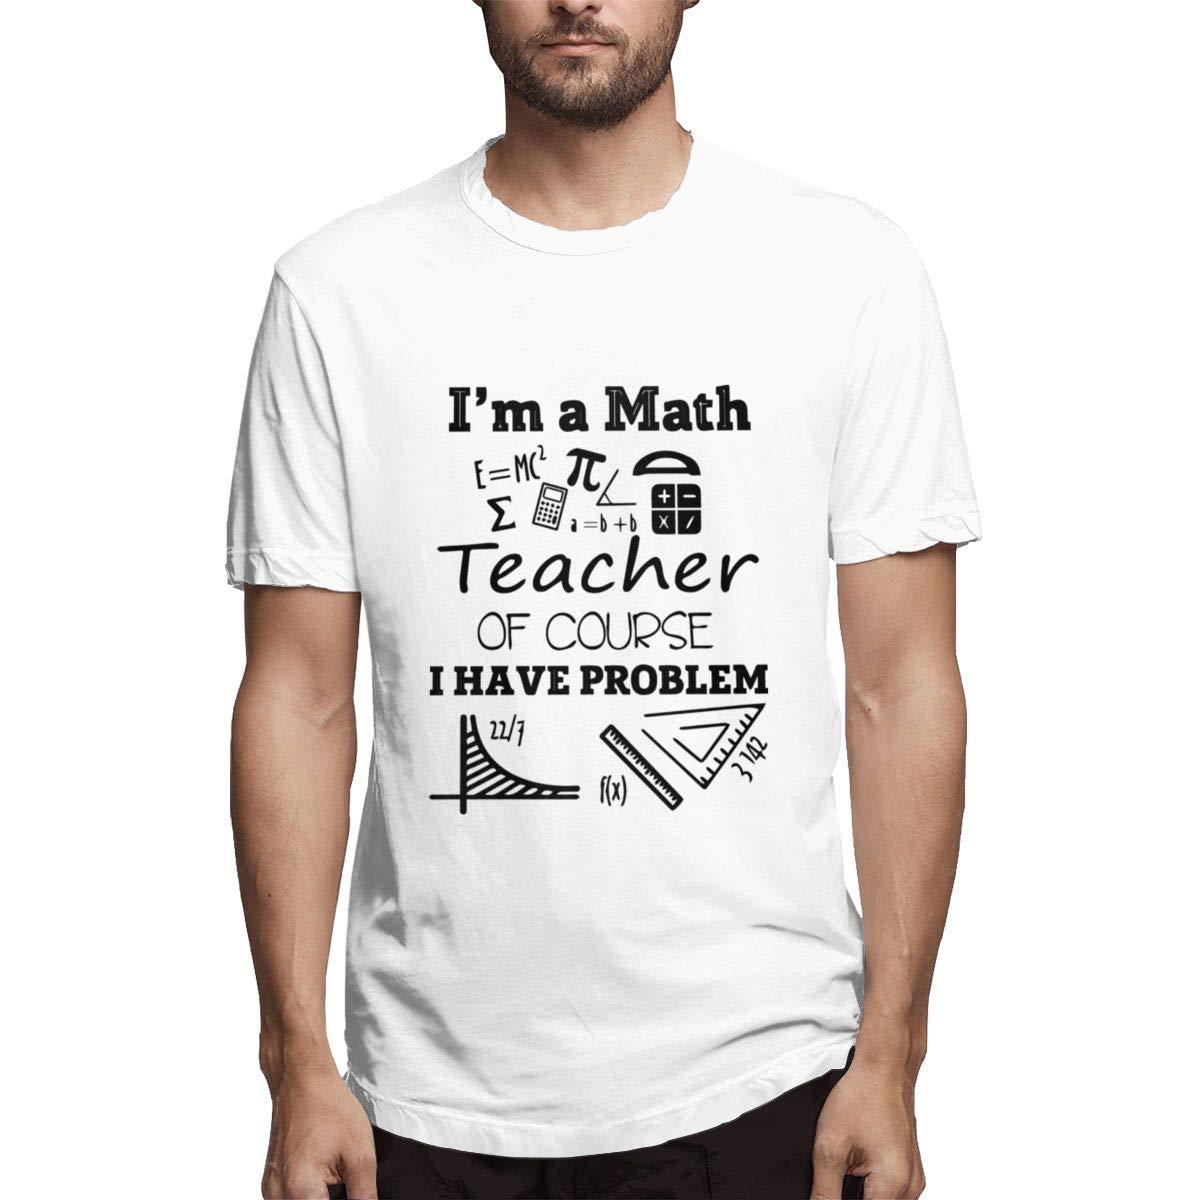 VIIHAHN Men Design Im A Math Teacher I Have Problem Man Casual Athleticround Neck Short Sleeve T Shirts